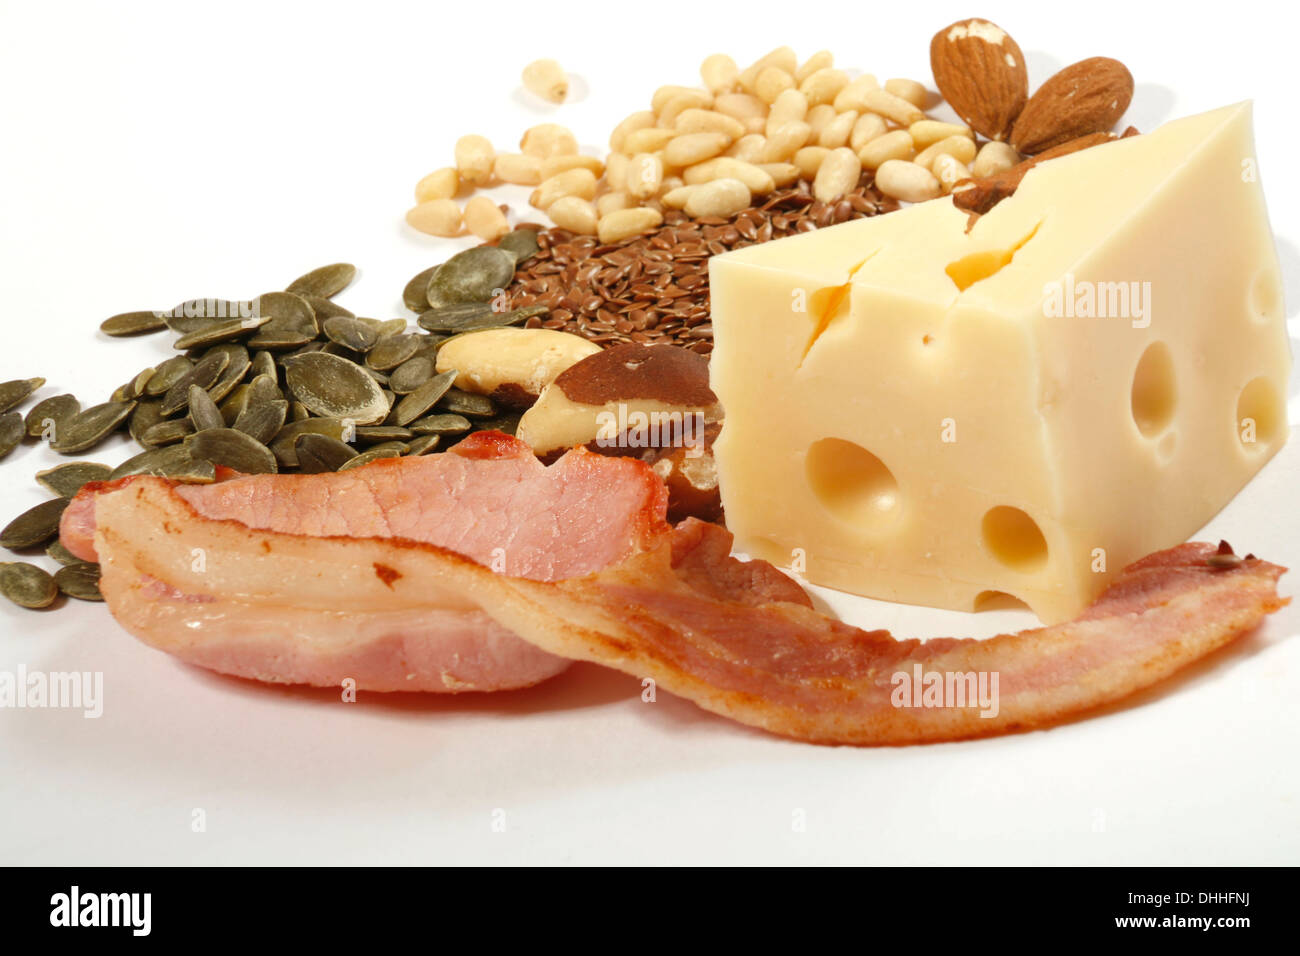 Foods Rich in Phosphorus - Stock Image